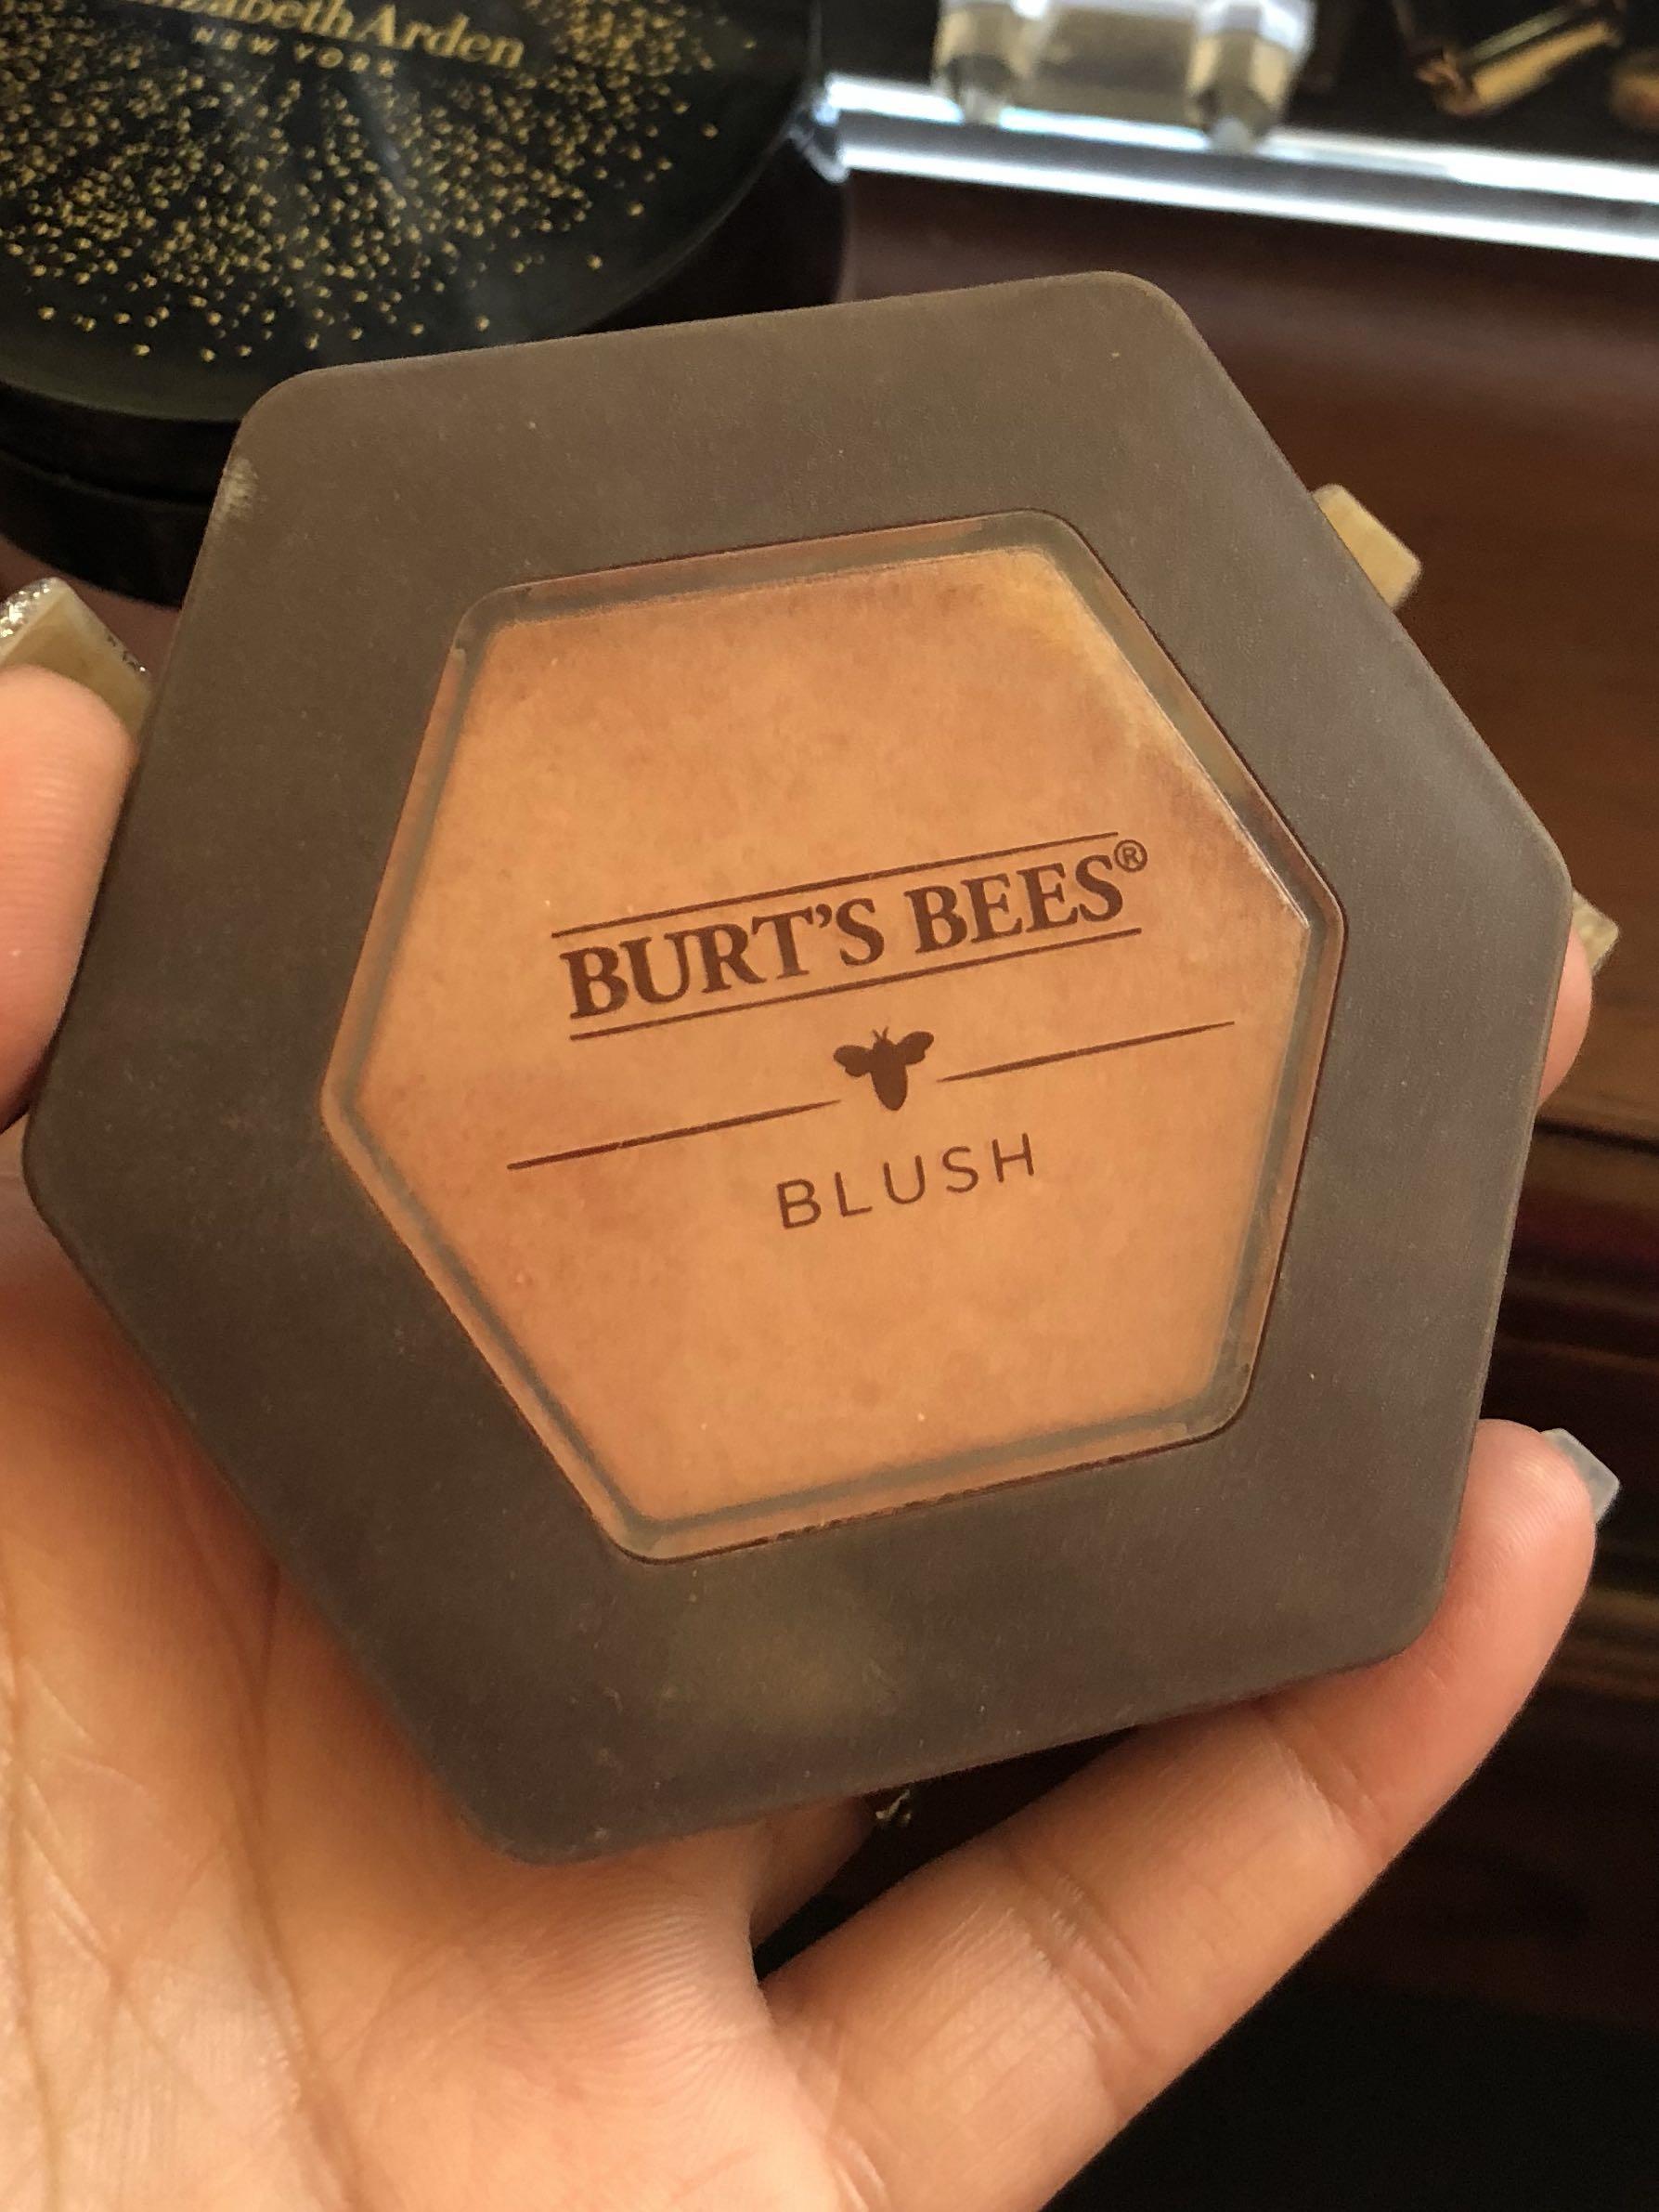 Burt Bees Blush Bare Peach - LOVED by Kathleen lights